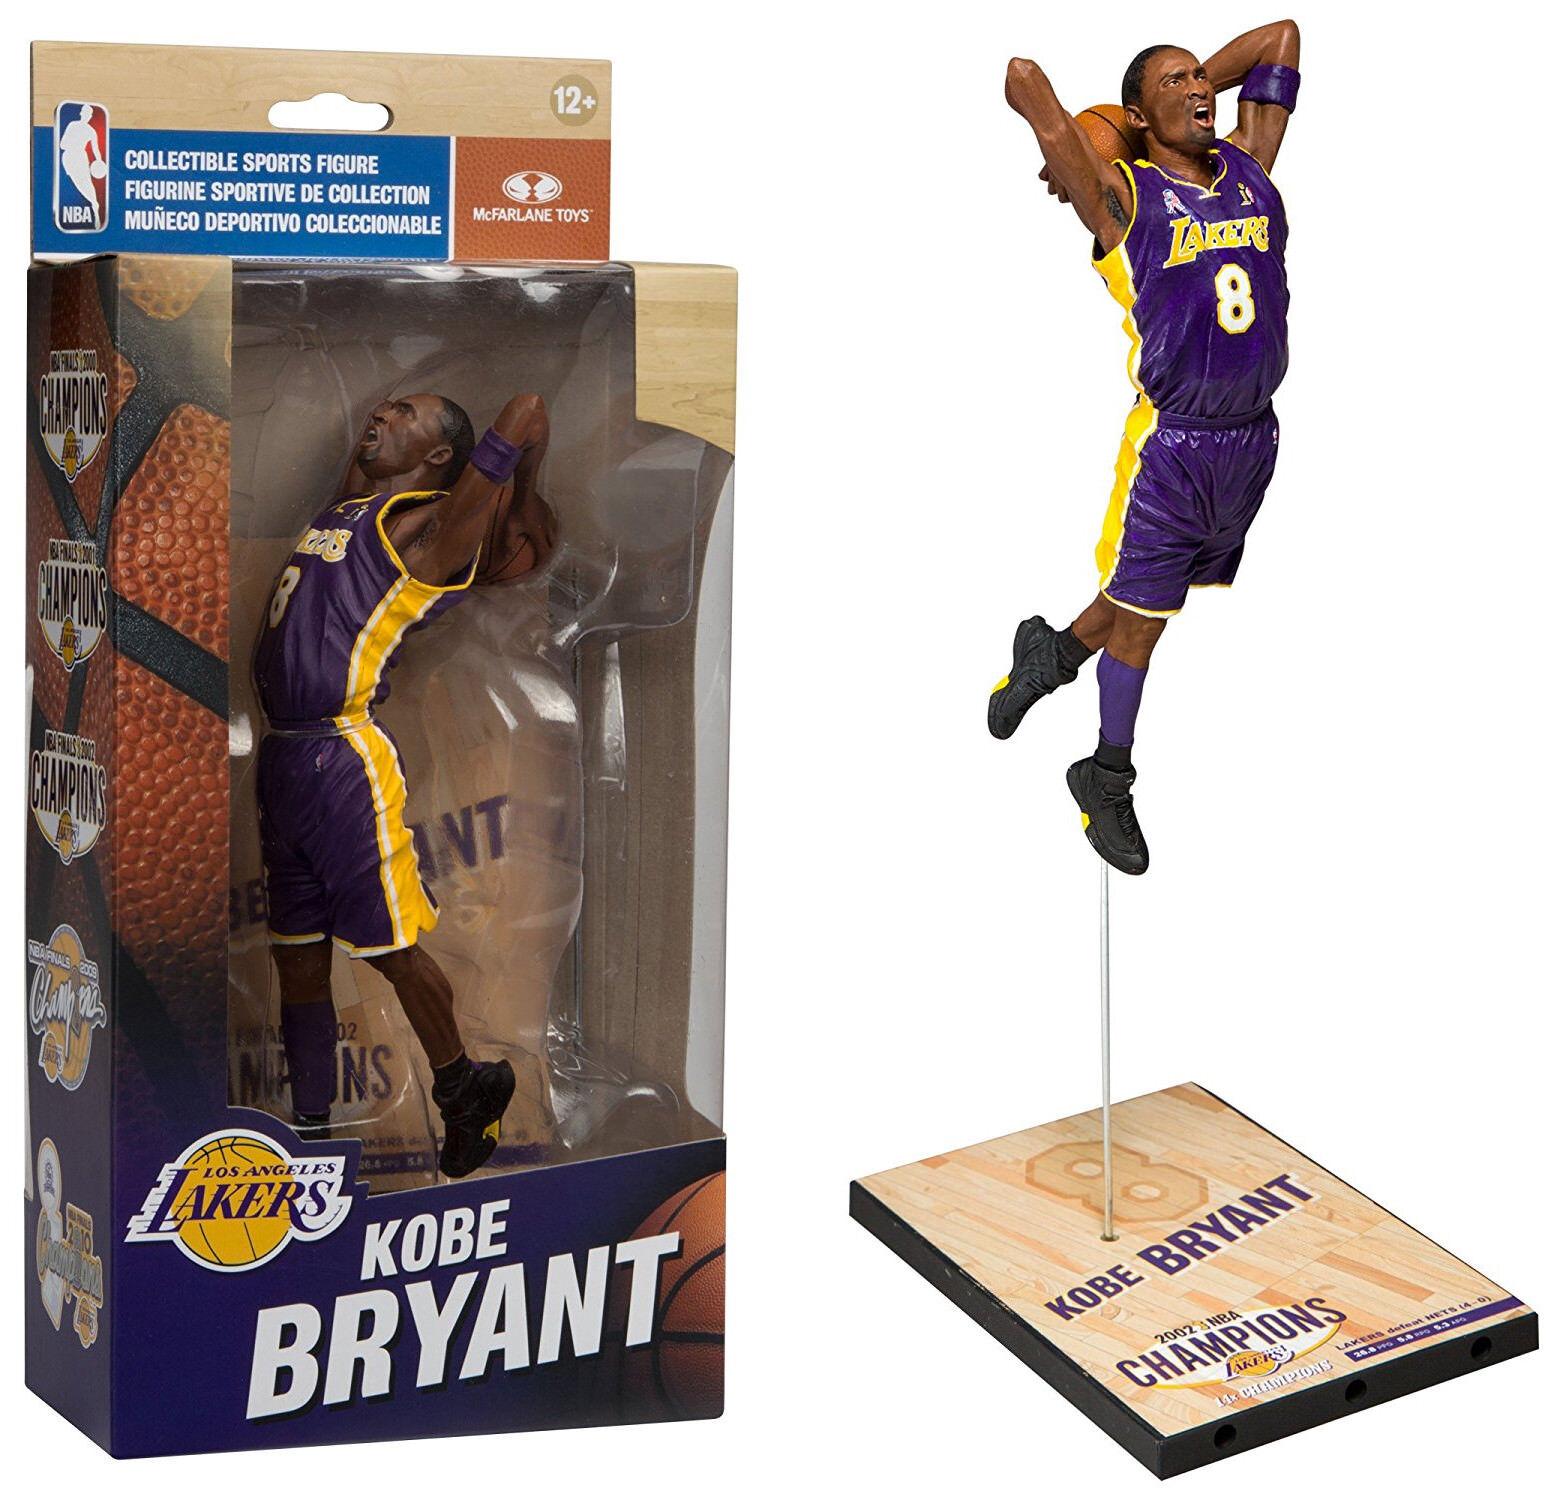 McFarlane giocattoli NBA  KOBE BRYANT (2002) cifra  Limited  Ed. Championship Series  prezzo all'ingrosso e qualità affidabile